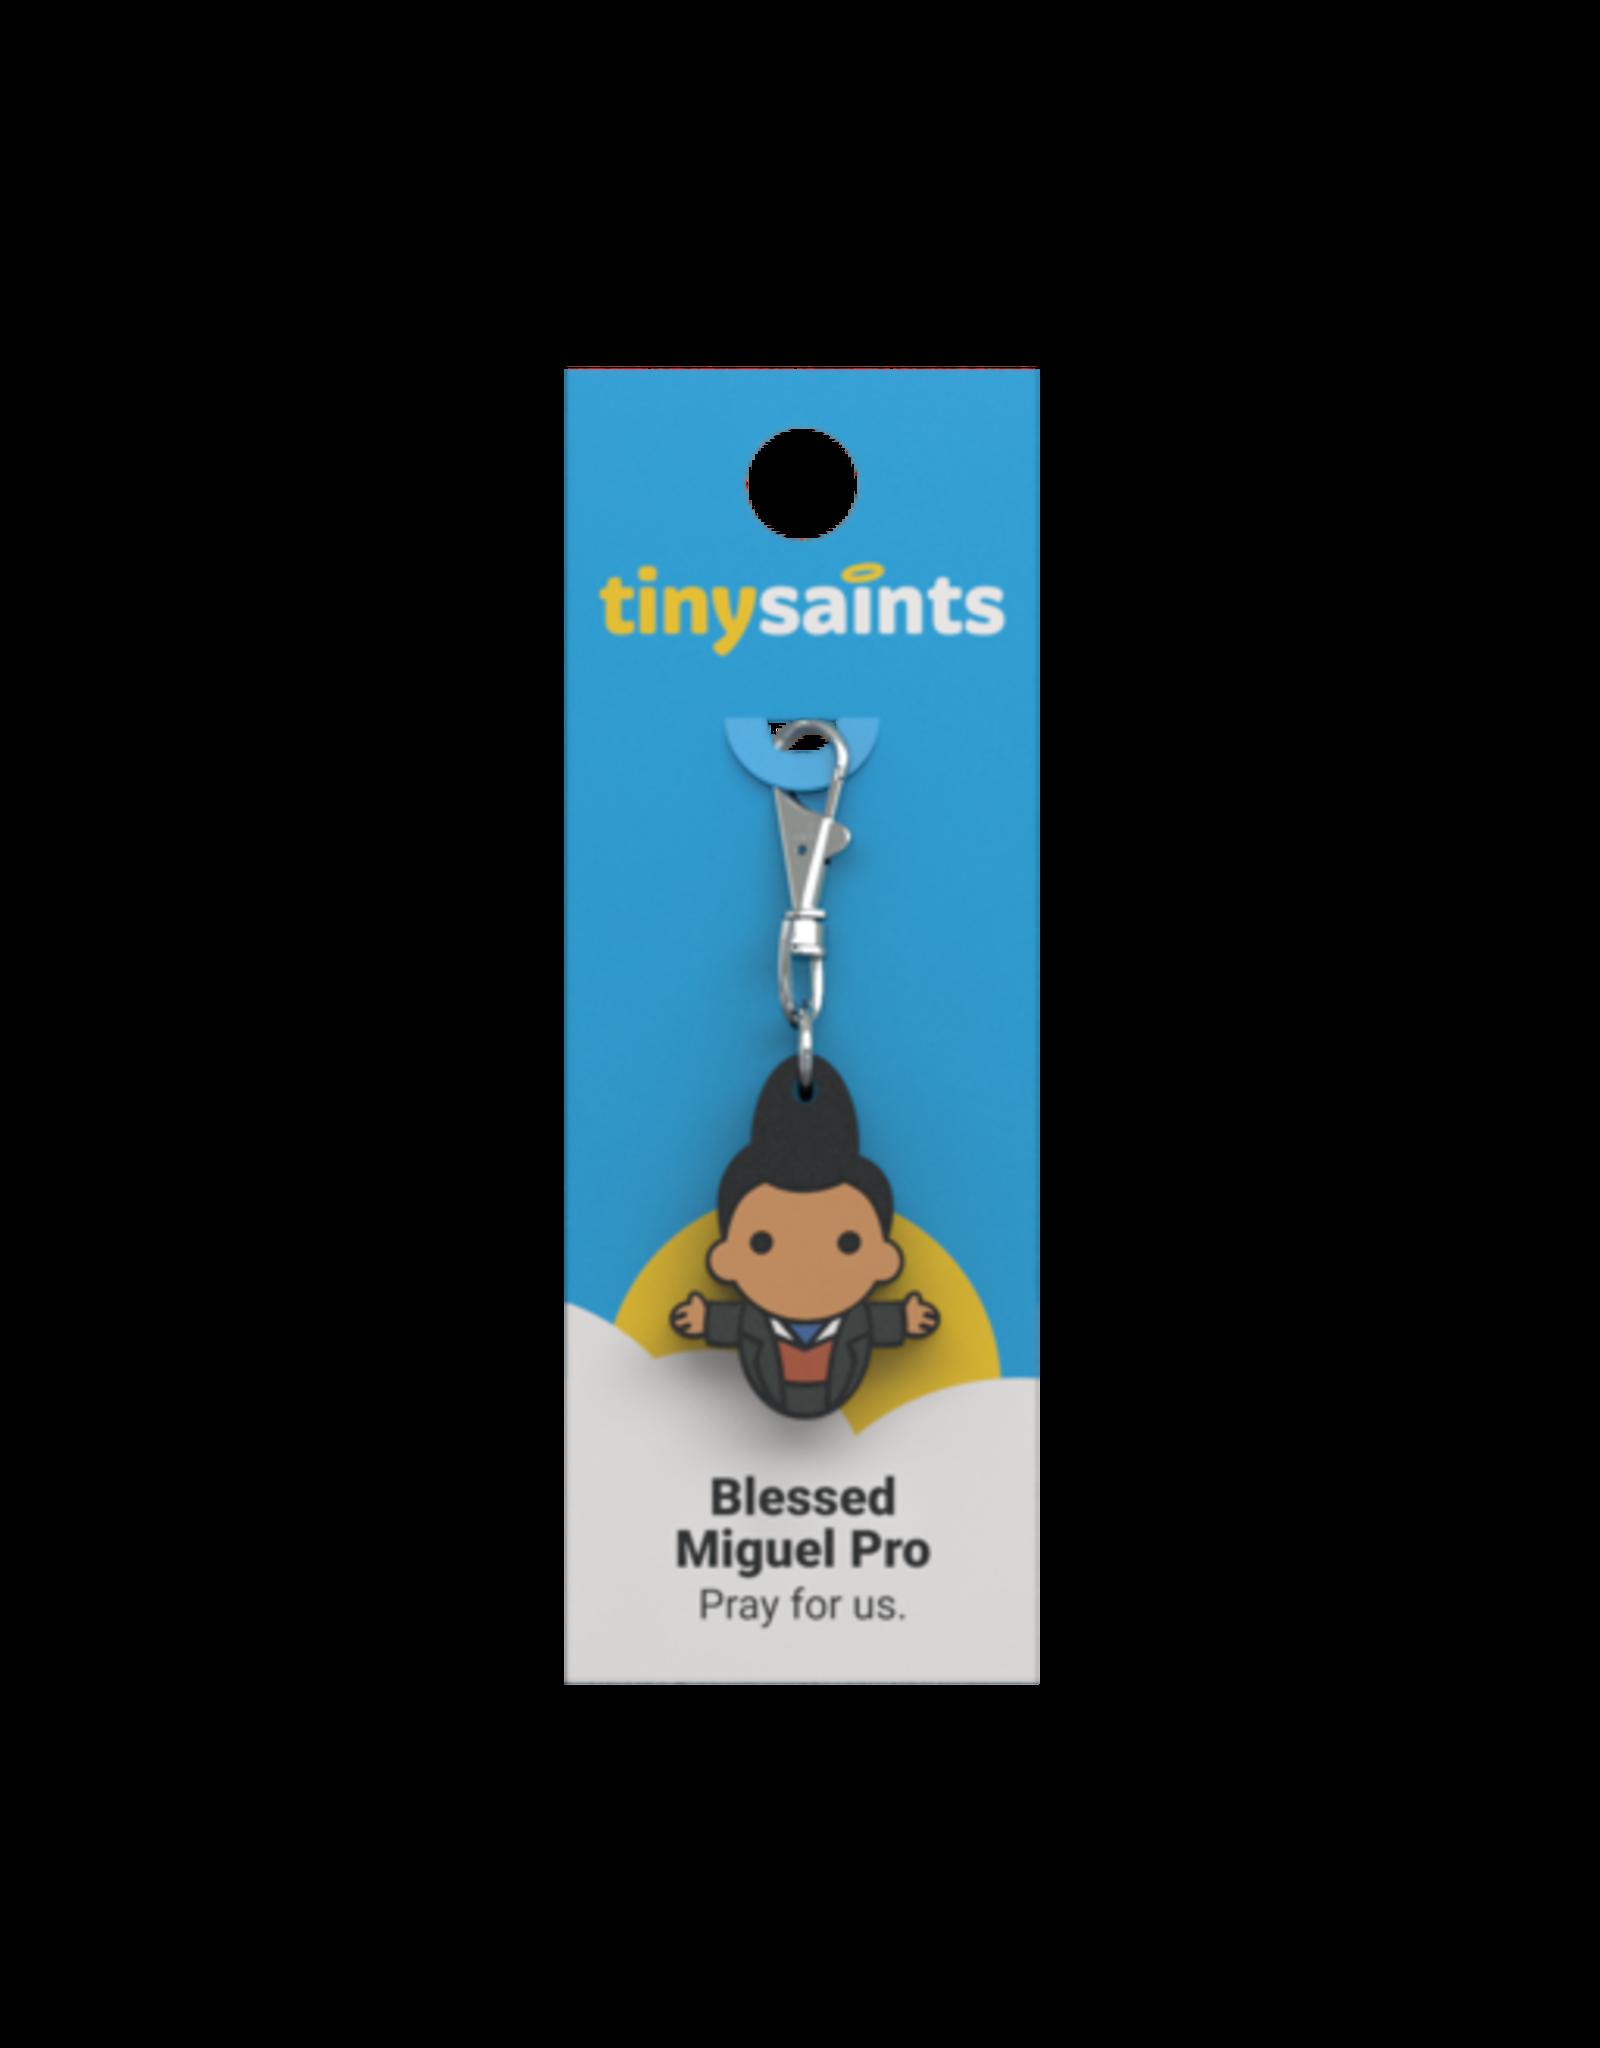 Tiny Saints Tiny Saints Charm - Blessed Miguel Pro